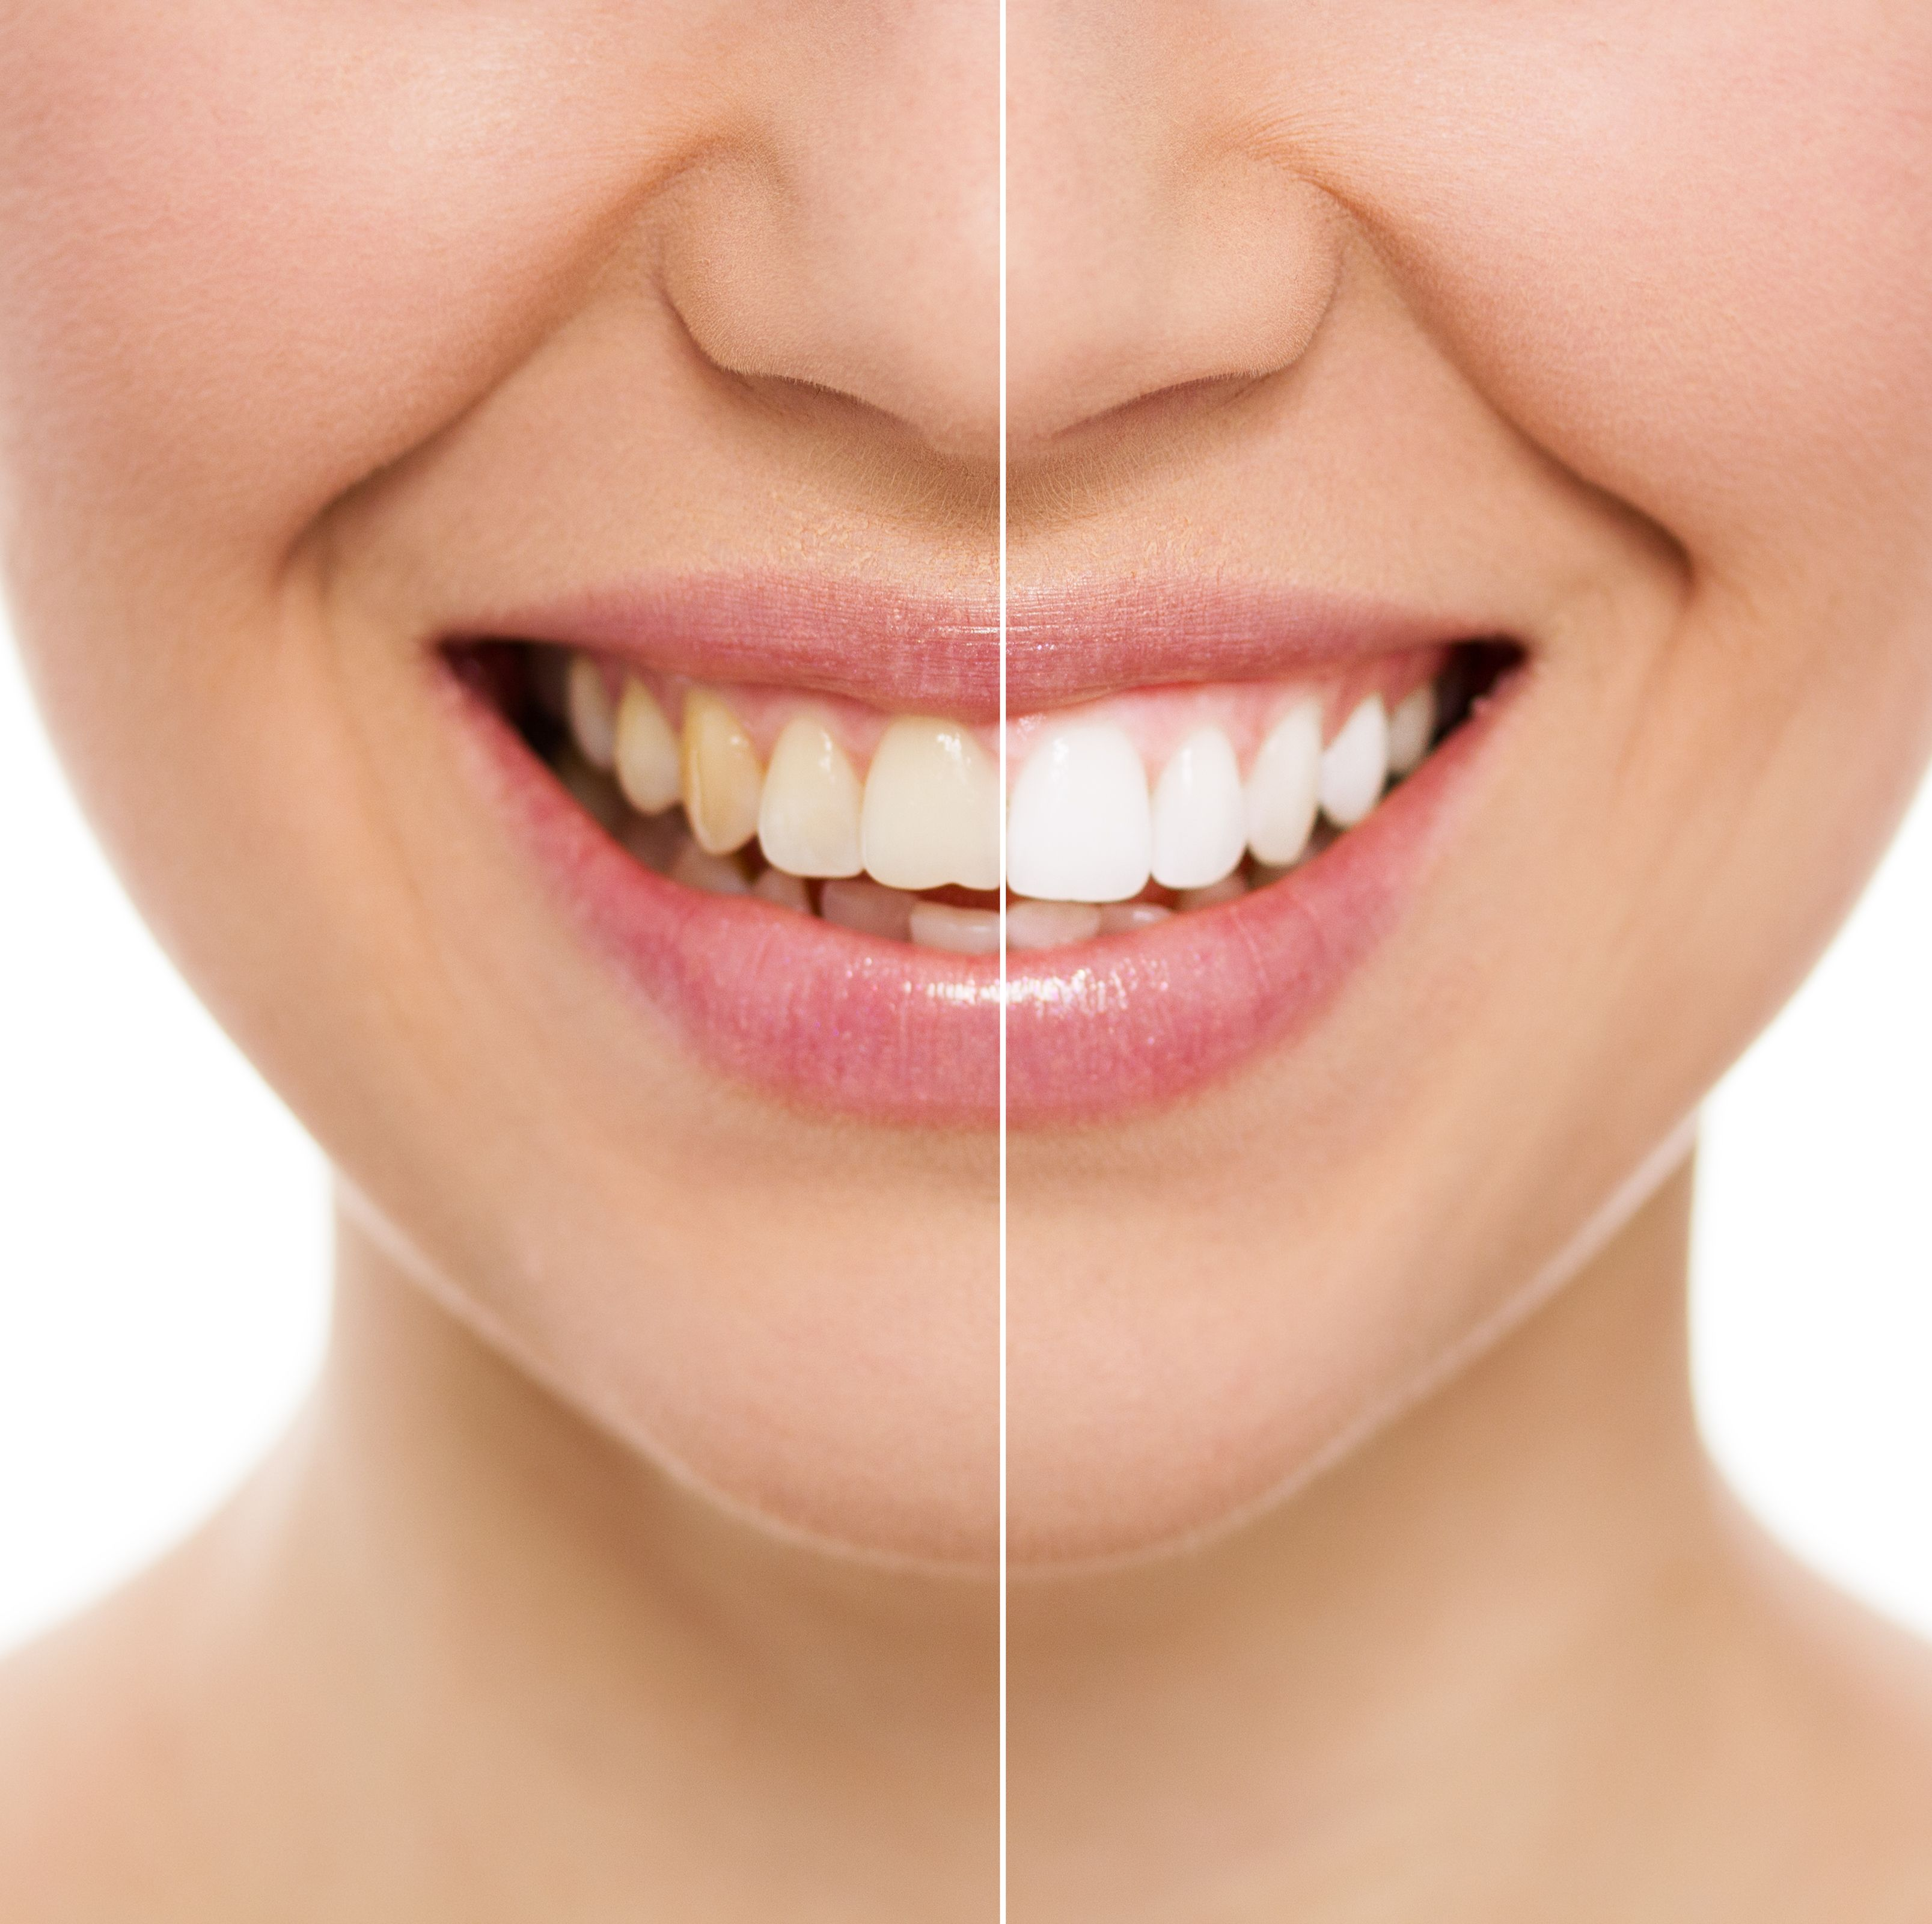 Blanqueamiento dental: Especialidades de Clínica Dental Plaza 58 (Dr. Pedro Fernández Lorente)